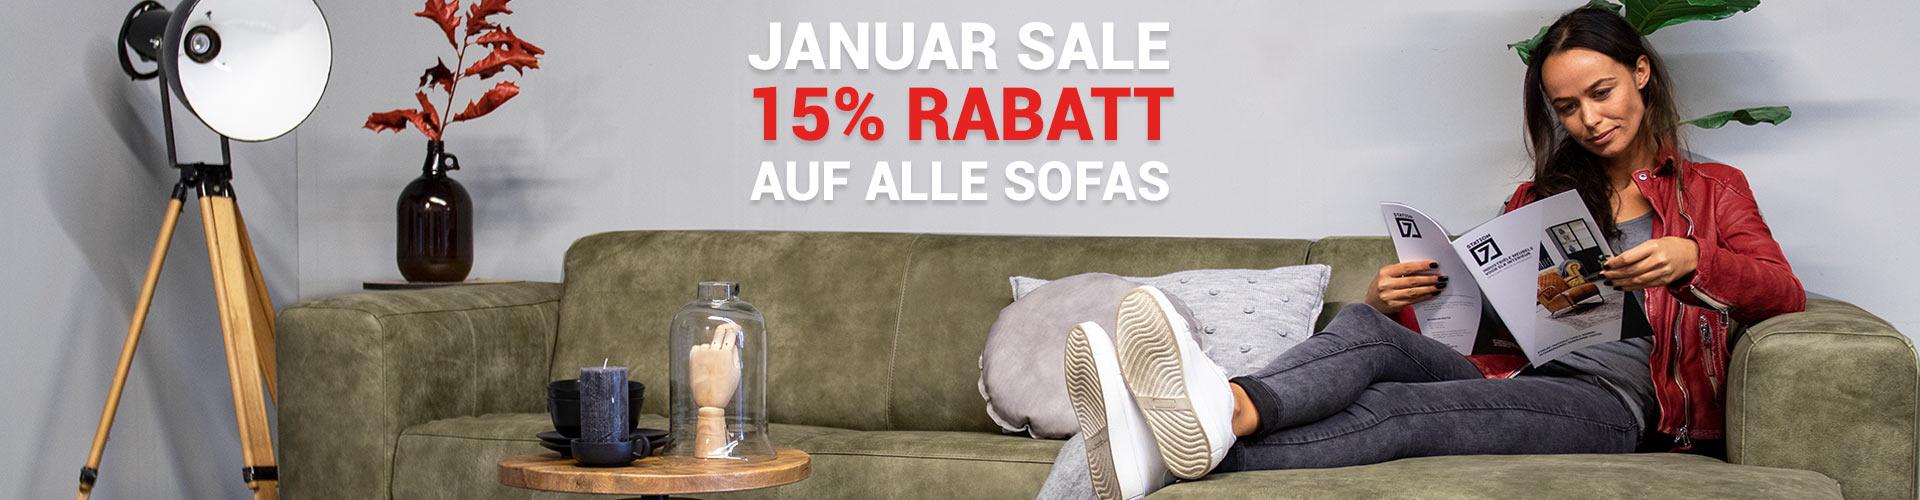 15% Rabatt auf alle Sofas